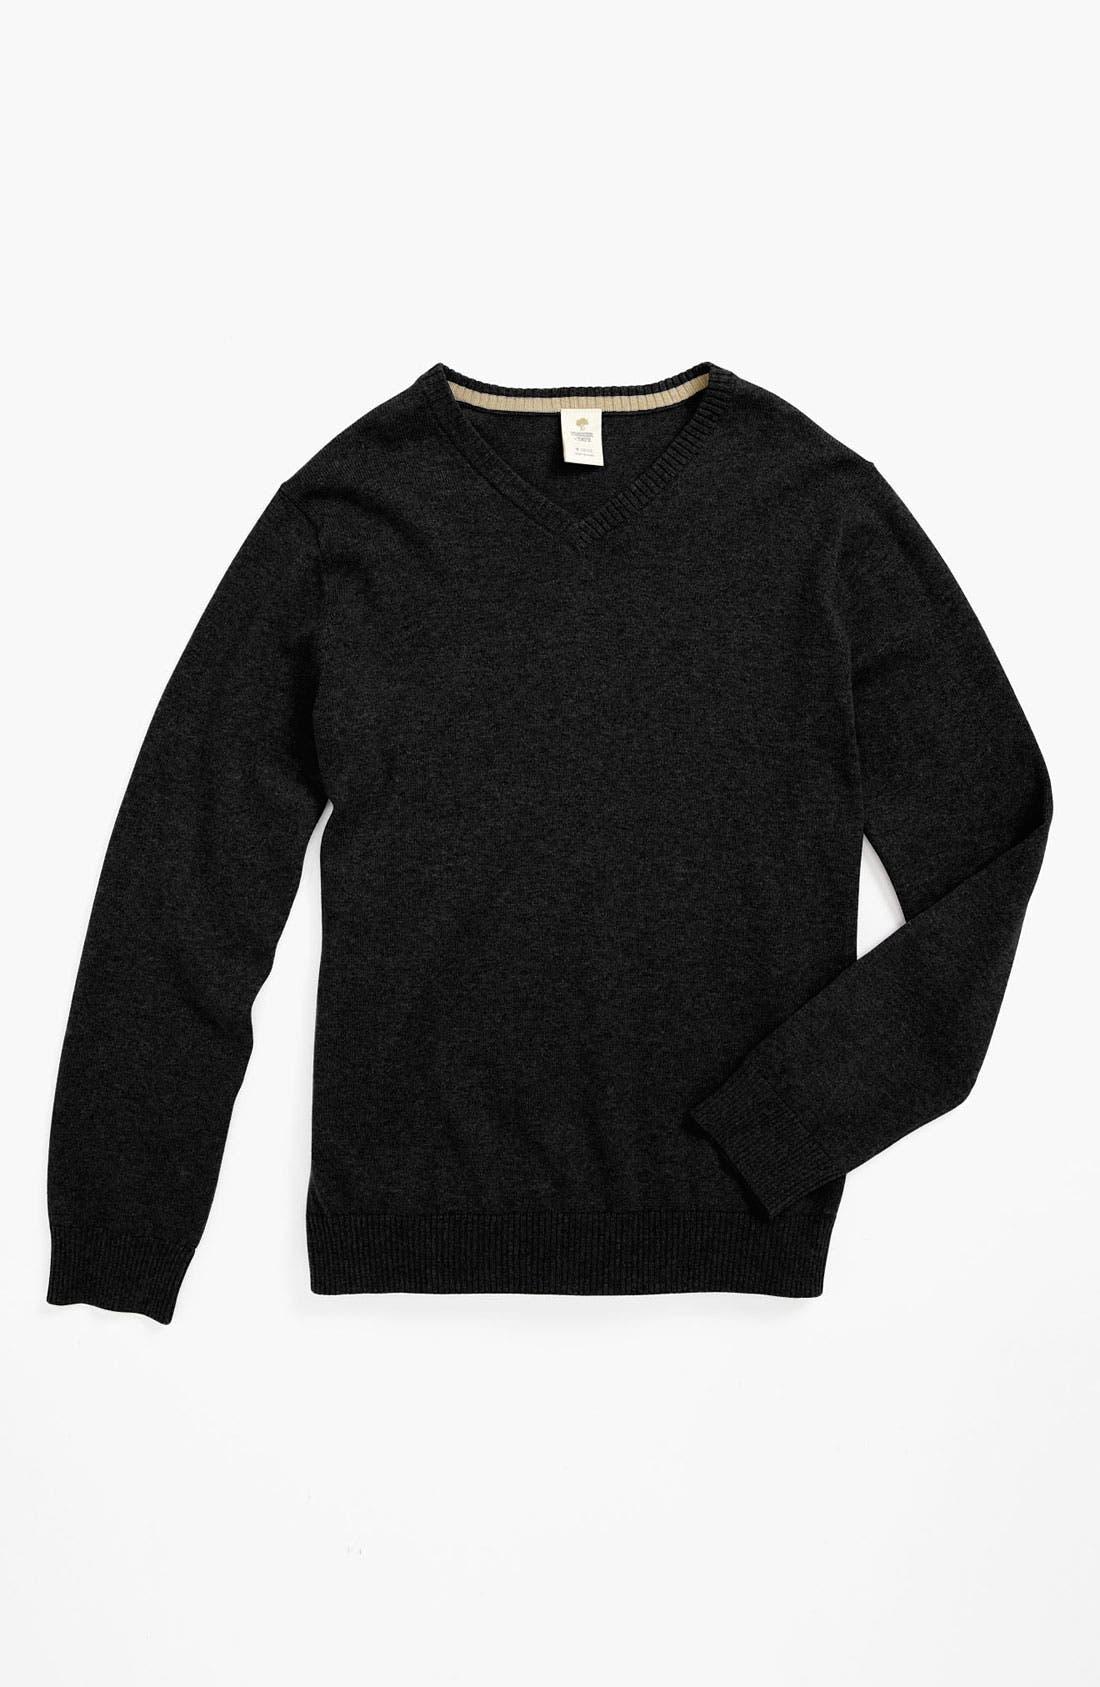 Main Image - Tucker + Tate 'Atticus' Cotton & Cashmere Sweater (Little Boys)